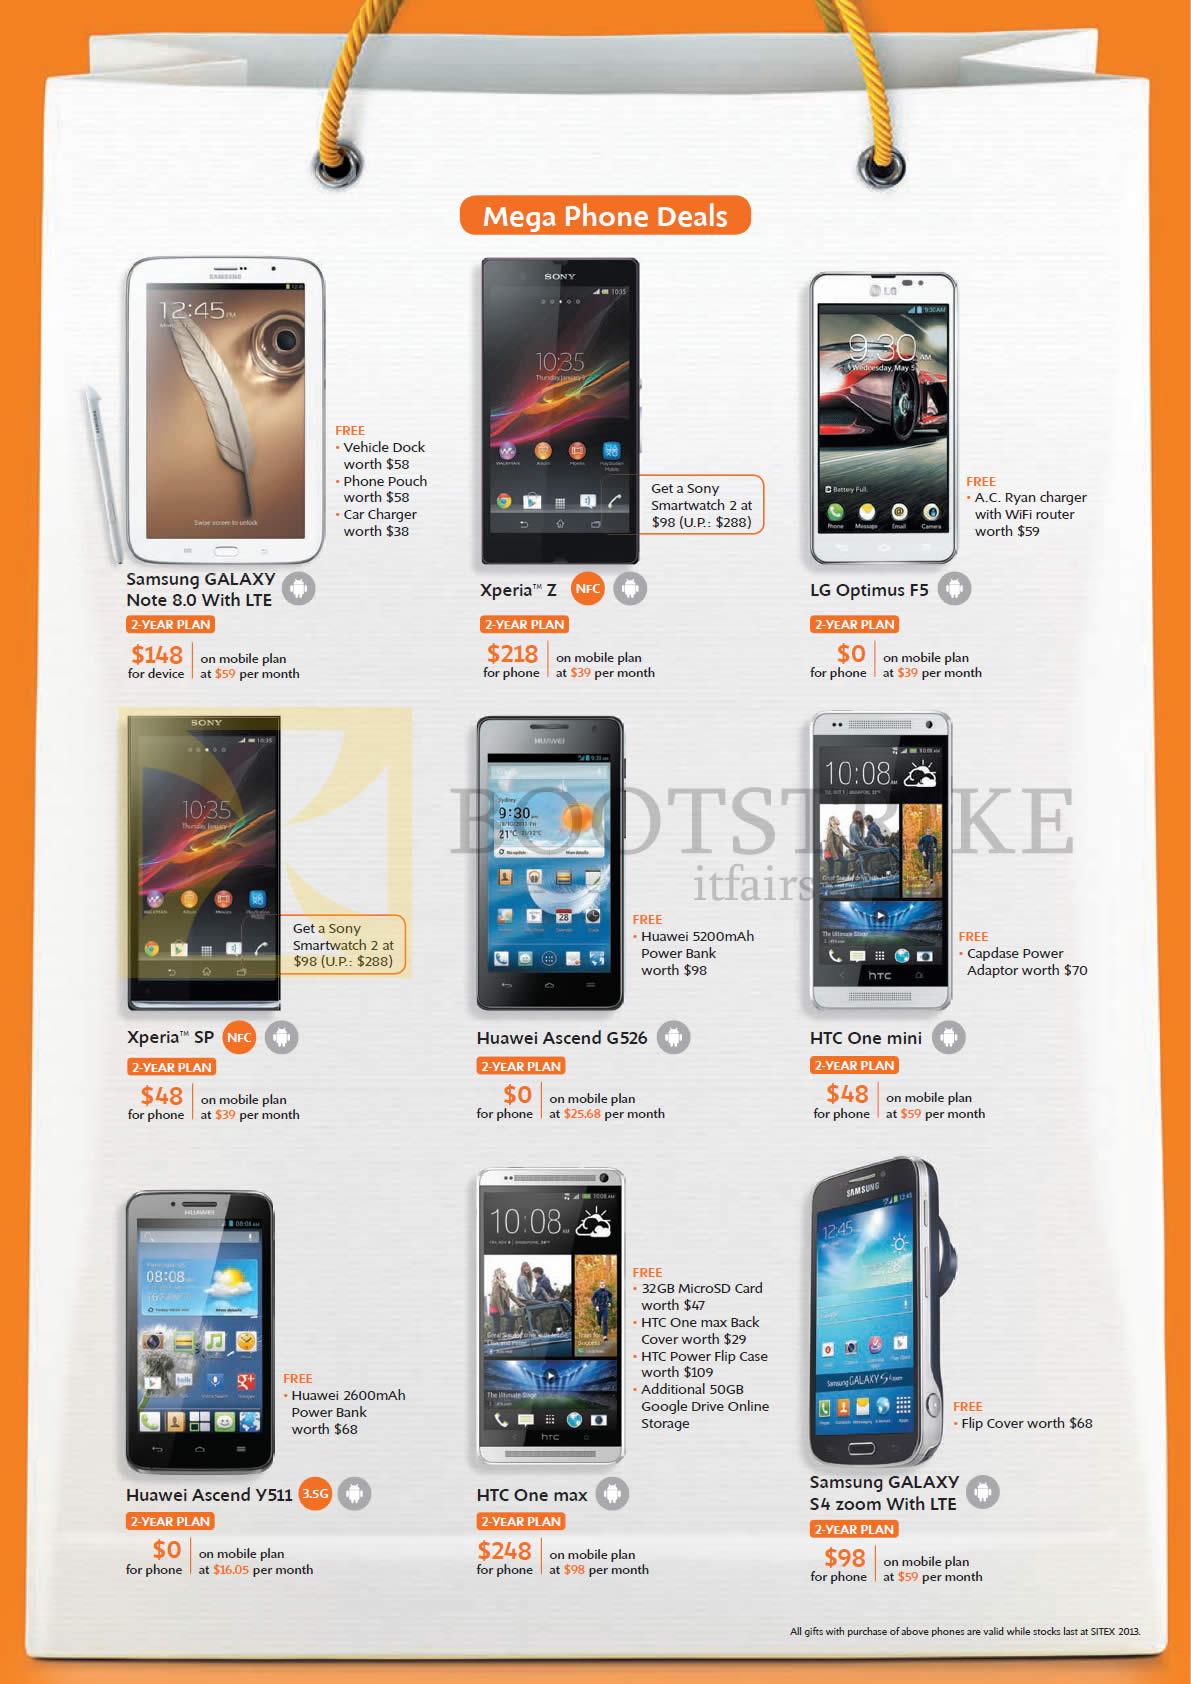 sony xperia u price list 2013. sitex 2013 price list image brochure of m1 mobile samsung galaxy note 8.0, s4 zoom. « sony xperia u